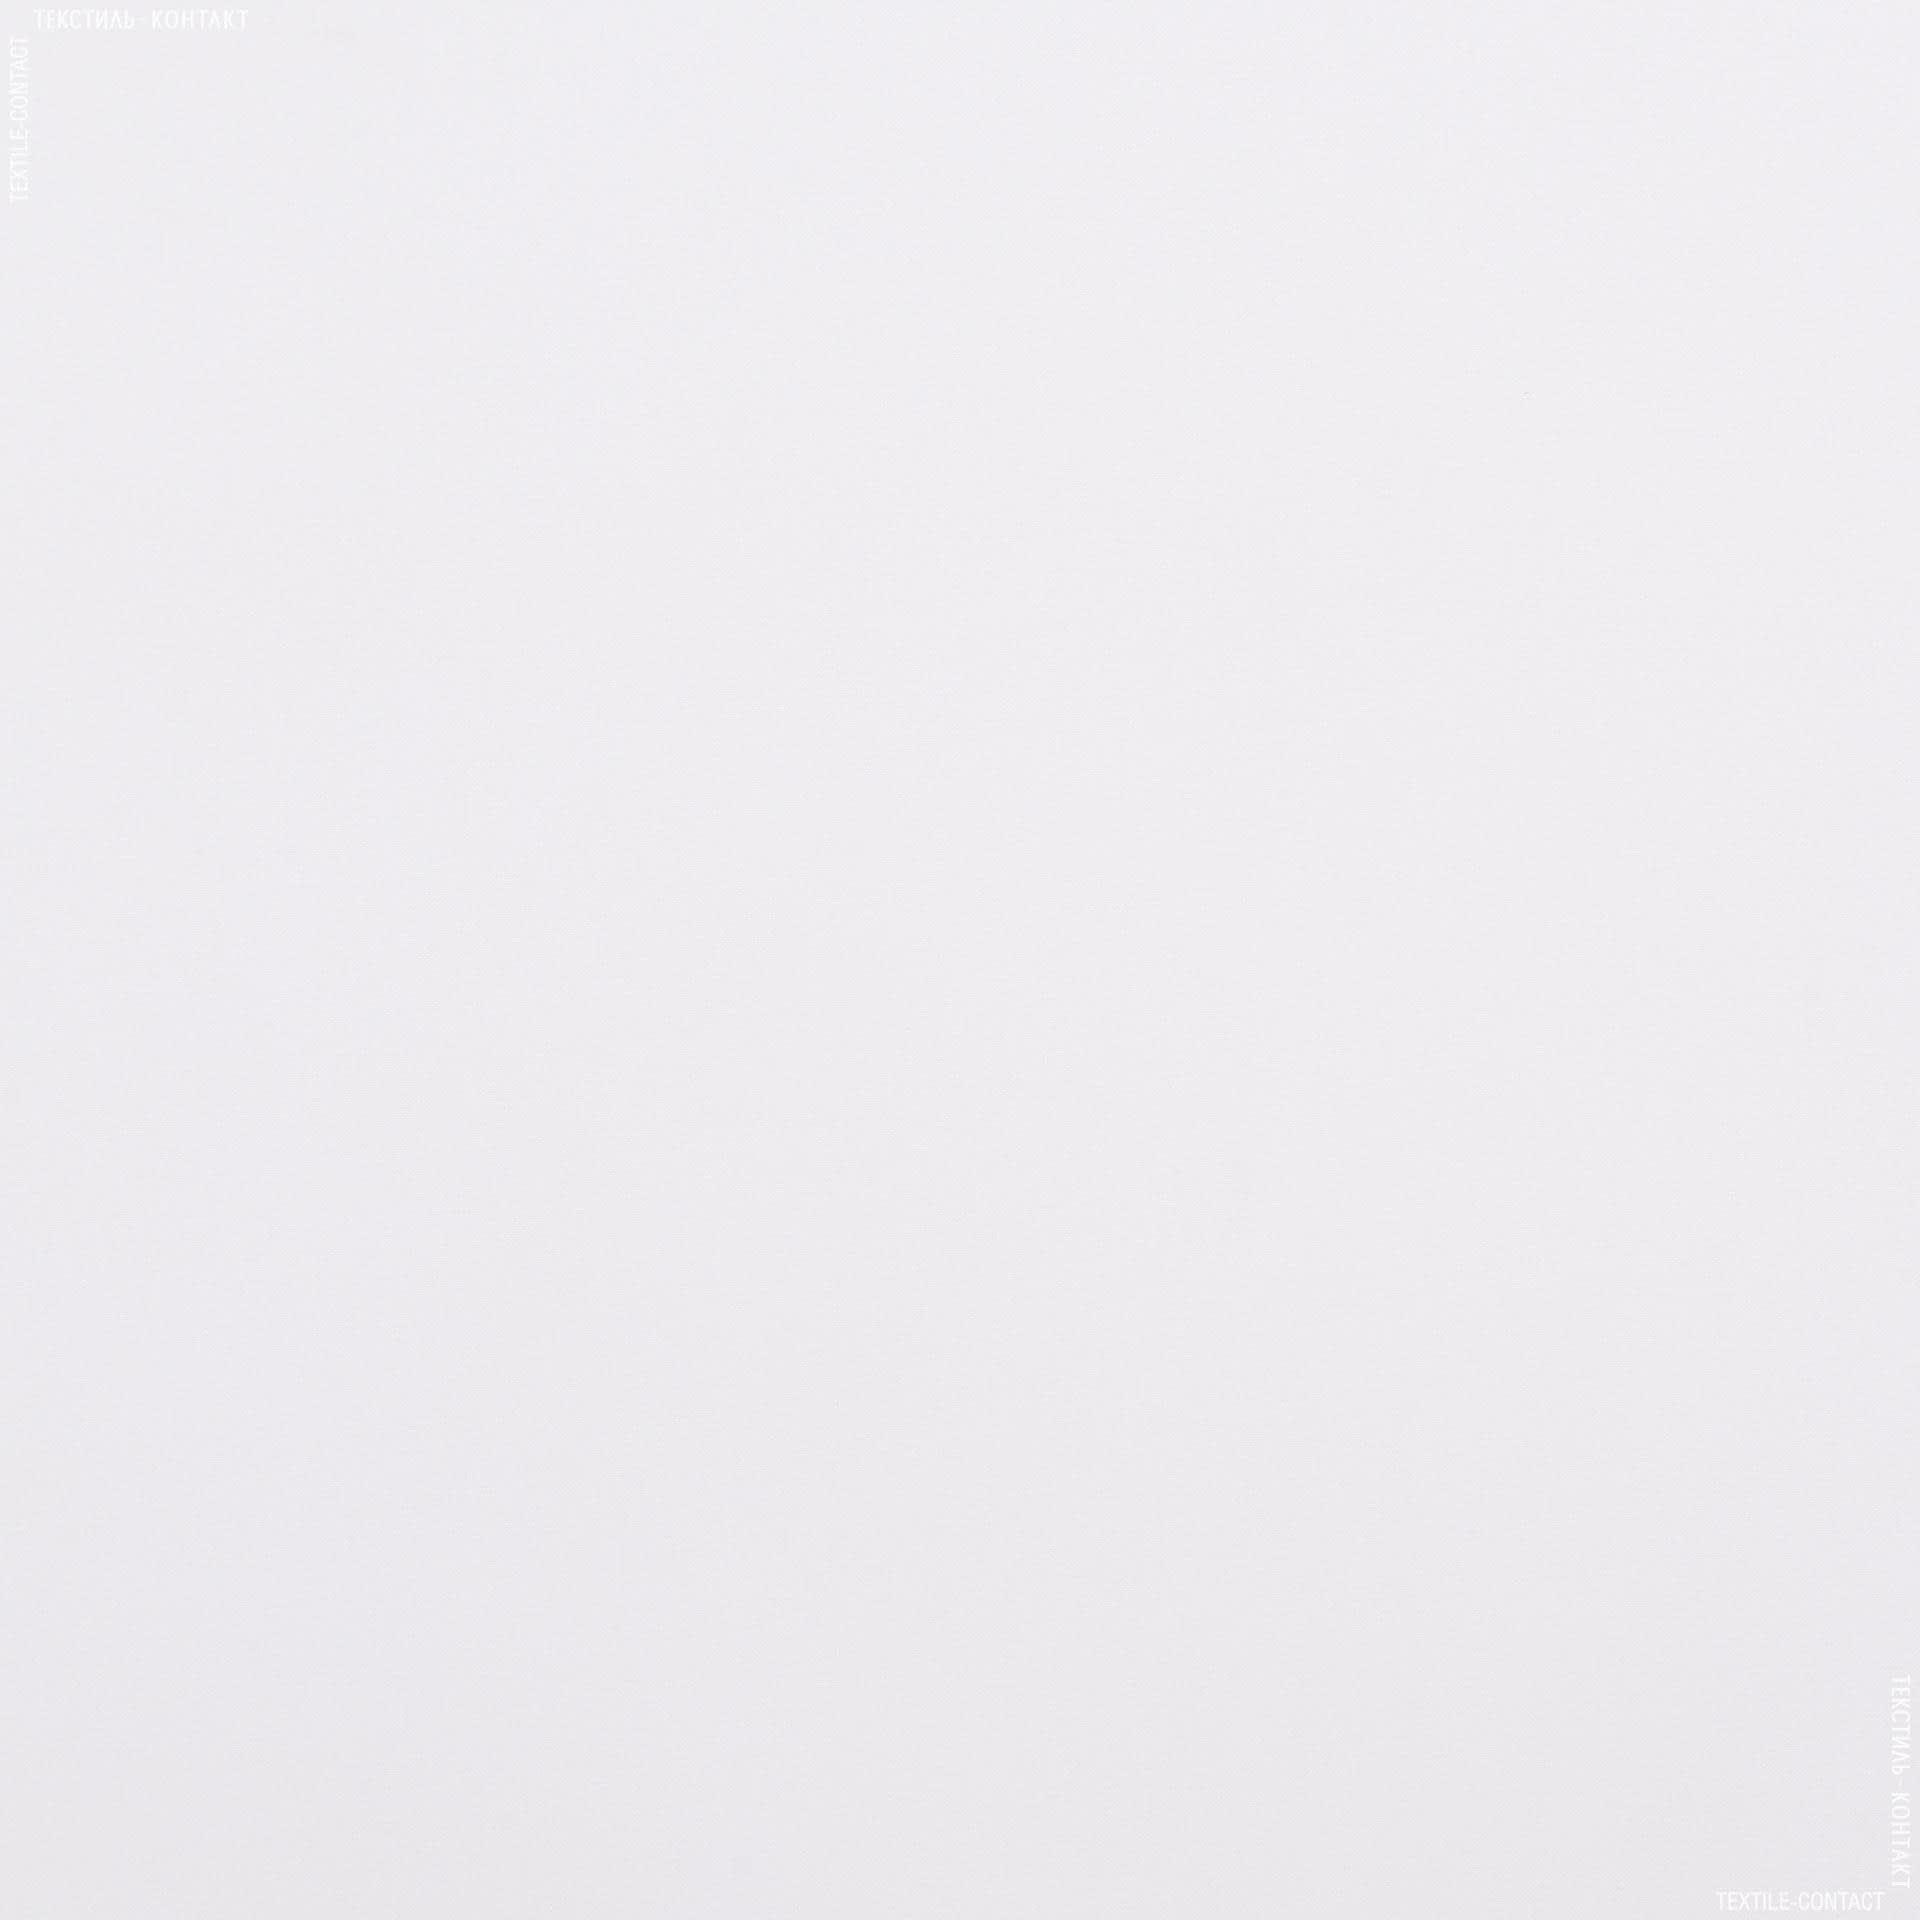 Ткани для спецодежды - Минимед белый